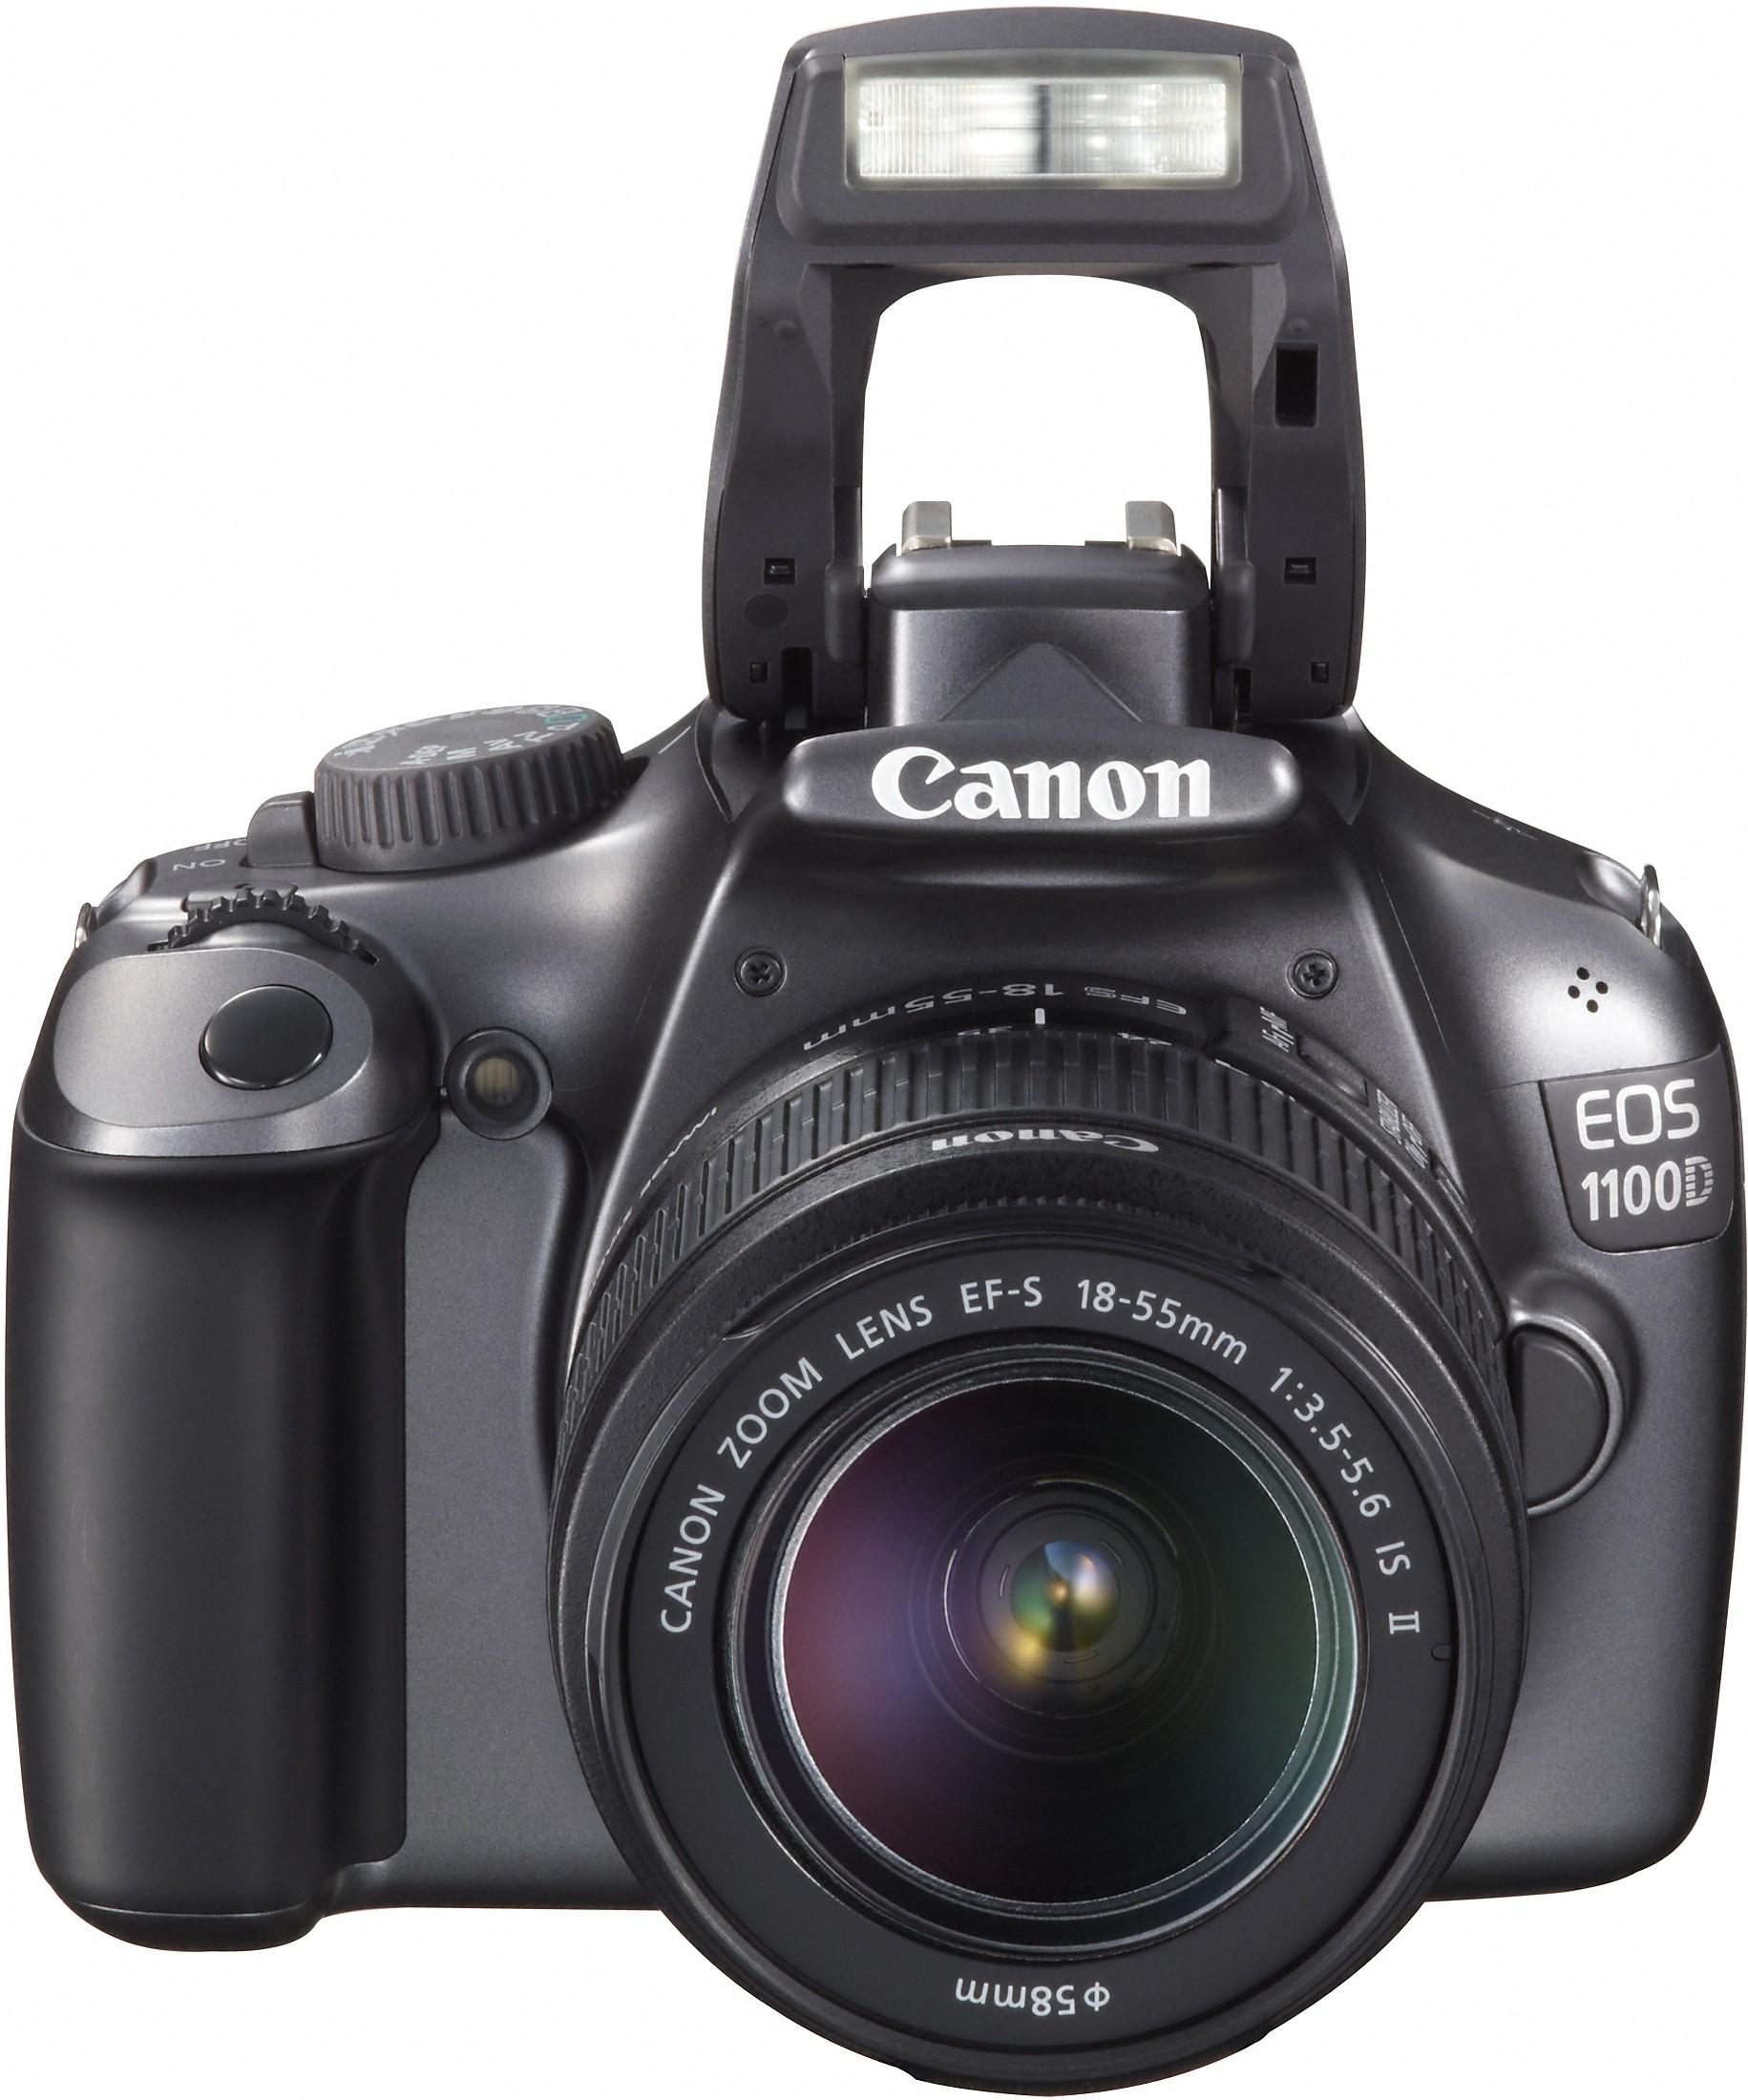 Camera Canon Dslr Camera 1100d canon 1100d dslr camera price images guru eos d slr